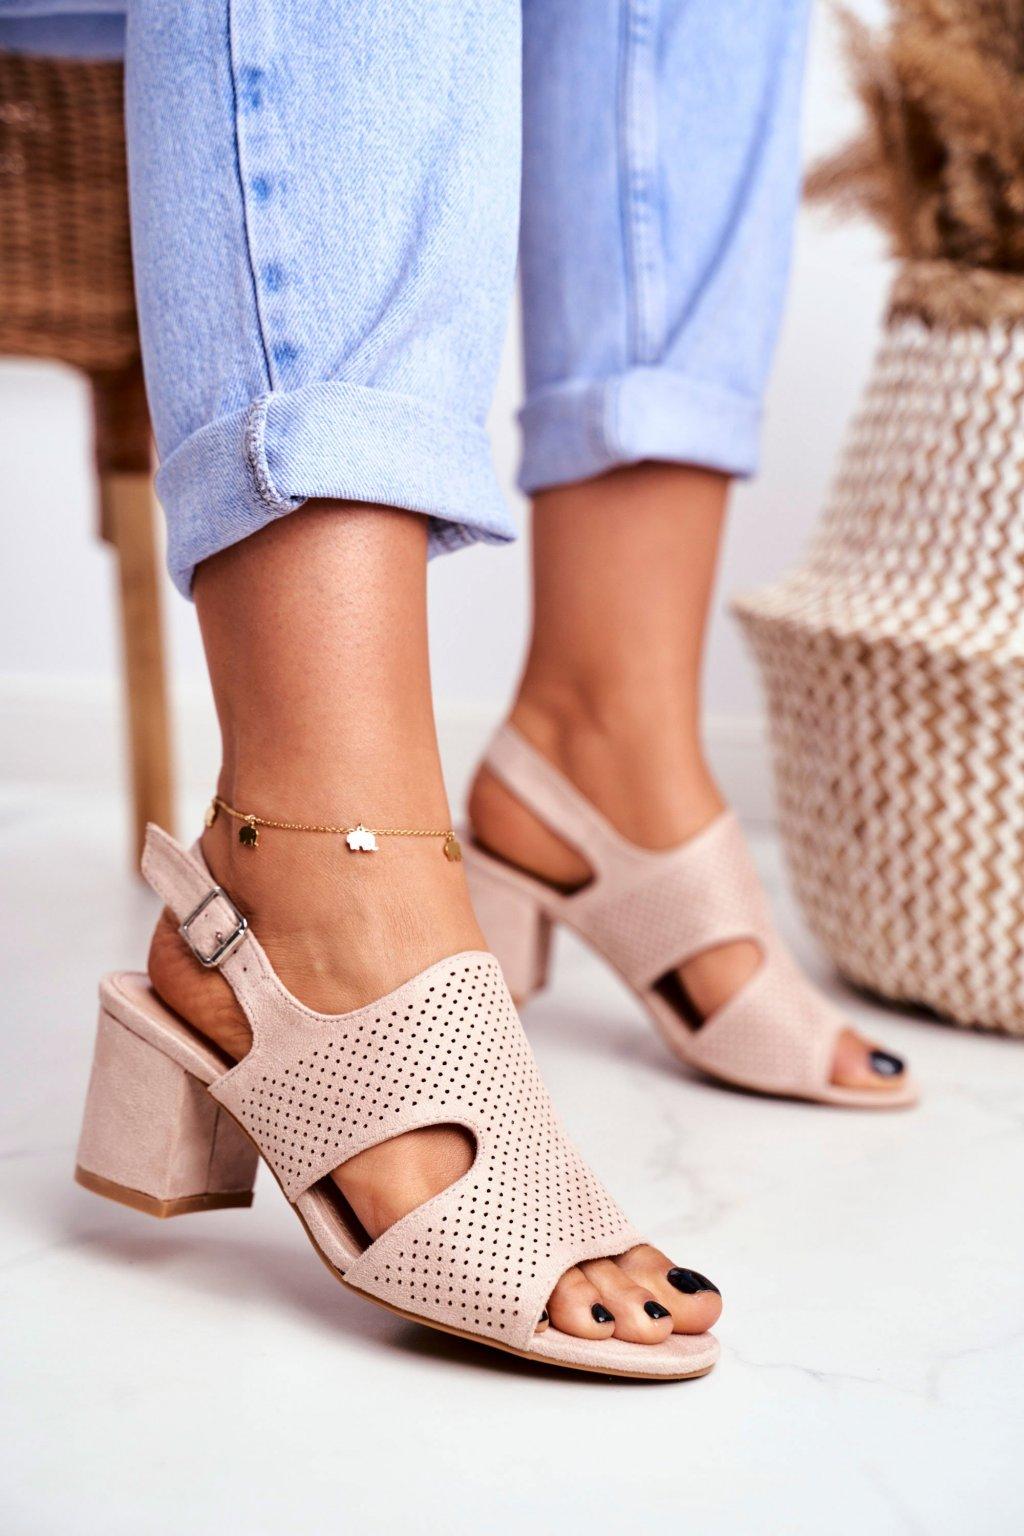 Dámske sandále na podpätku farba hnedá kód obuvi 1-122 BEIGE